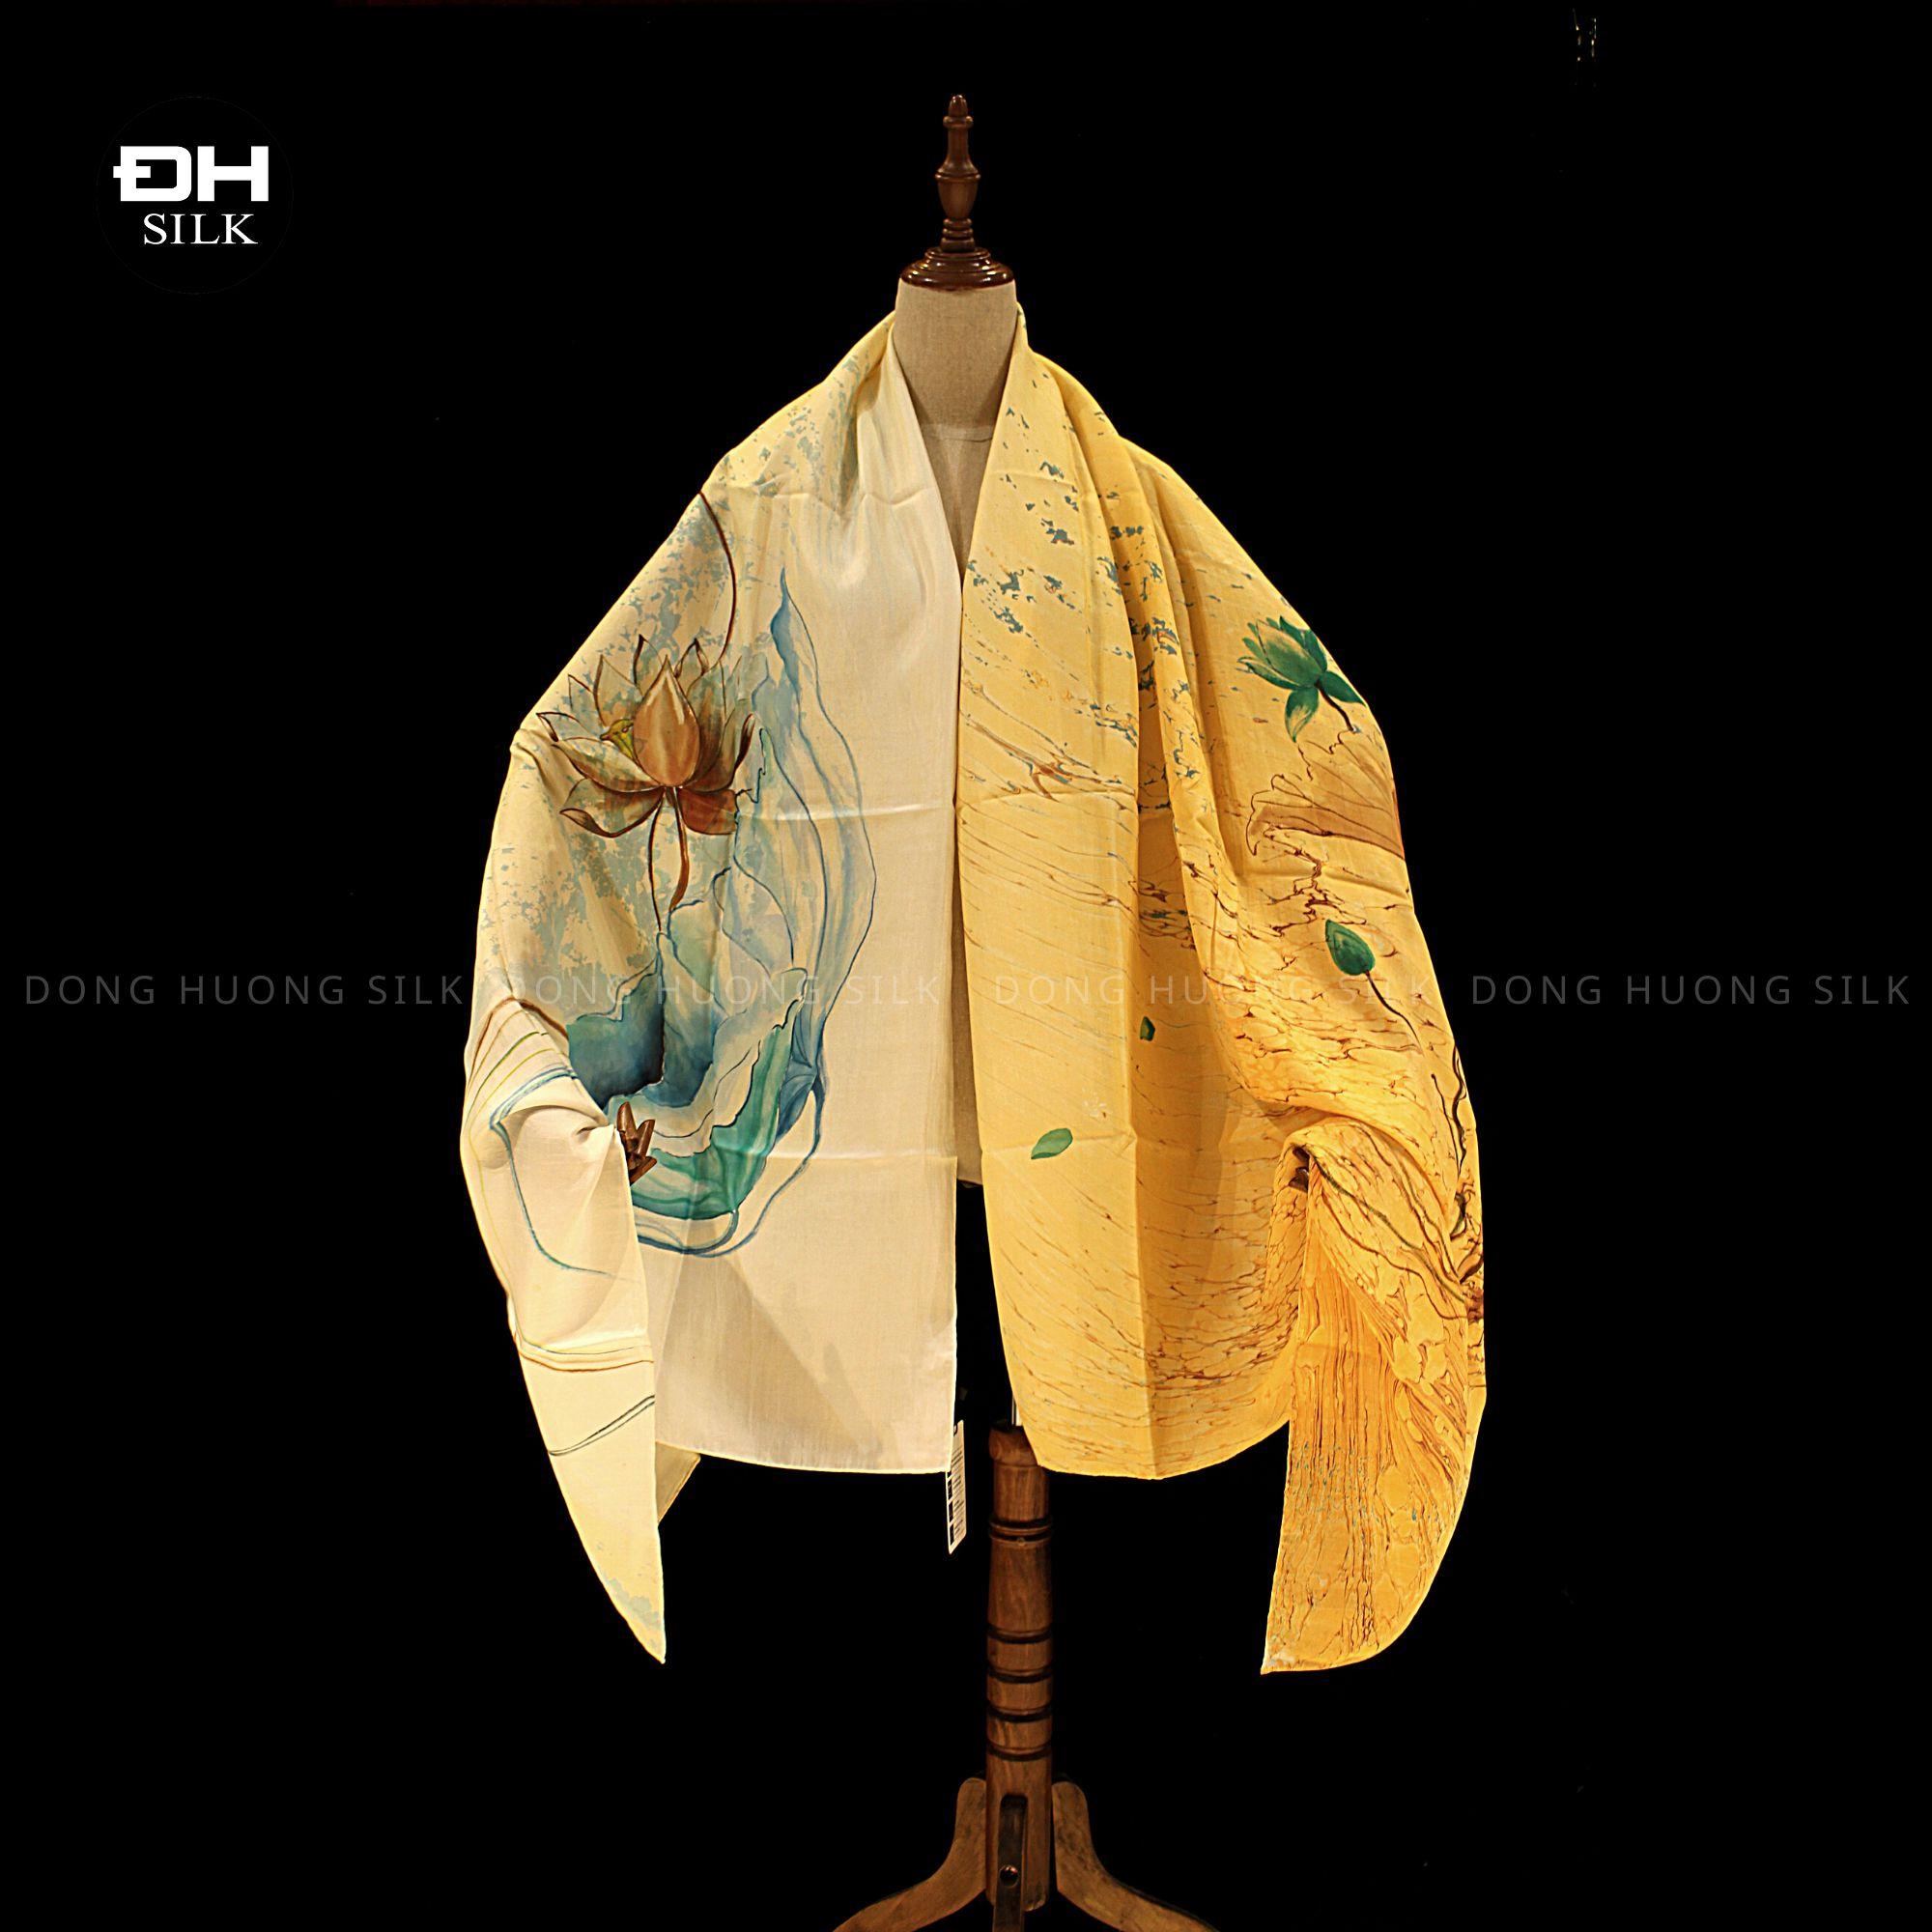 khan-lua-to-tam-ve-tay-thuy-an-nghe-thuat-hoa-sen-ho-thuy-Dong-Huong-Silk-7